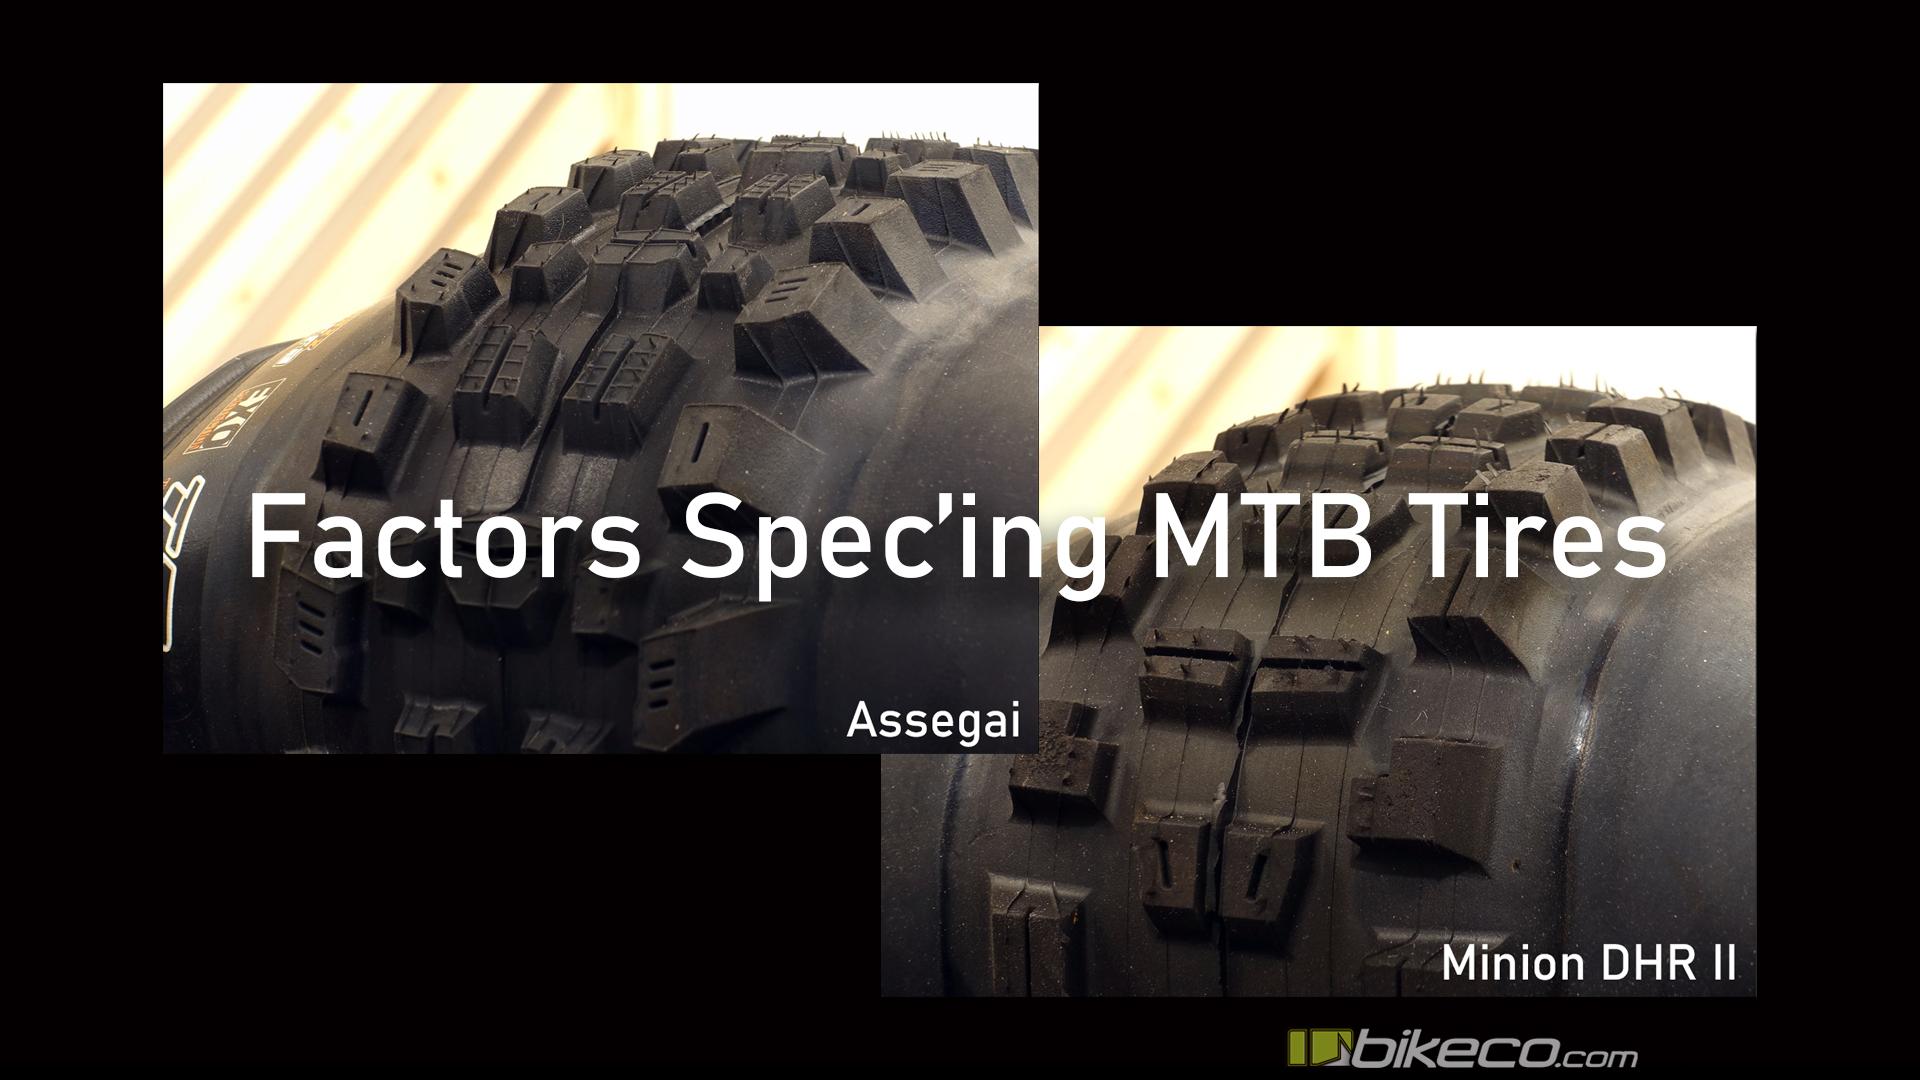 MTB Tire Comparison: Factors Spec'ing MTB Tires